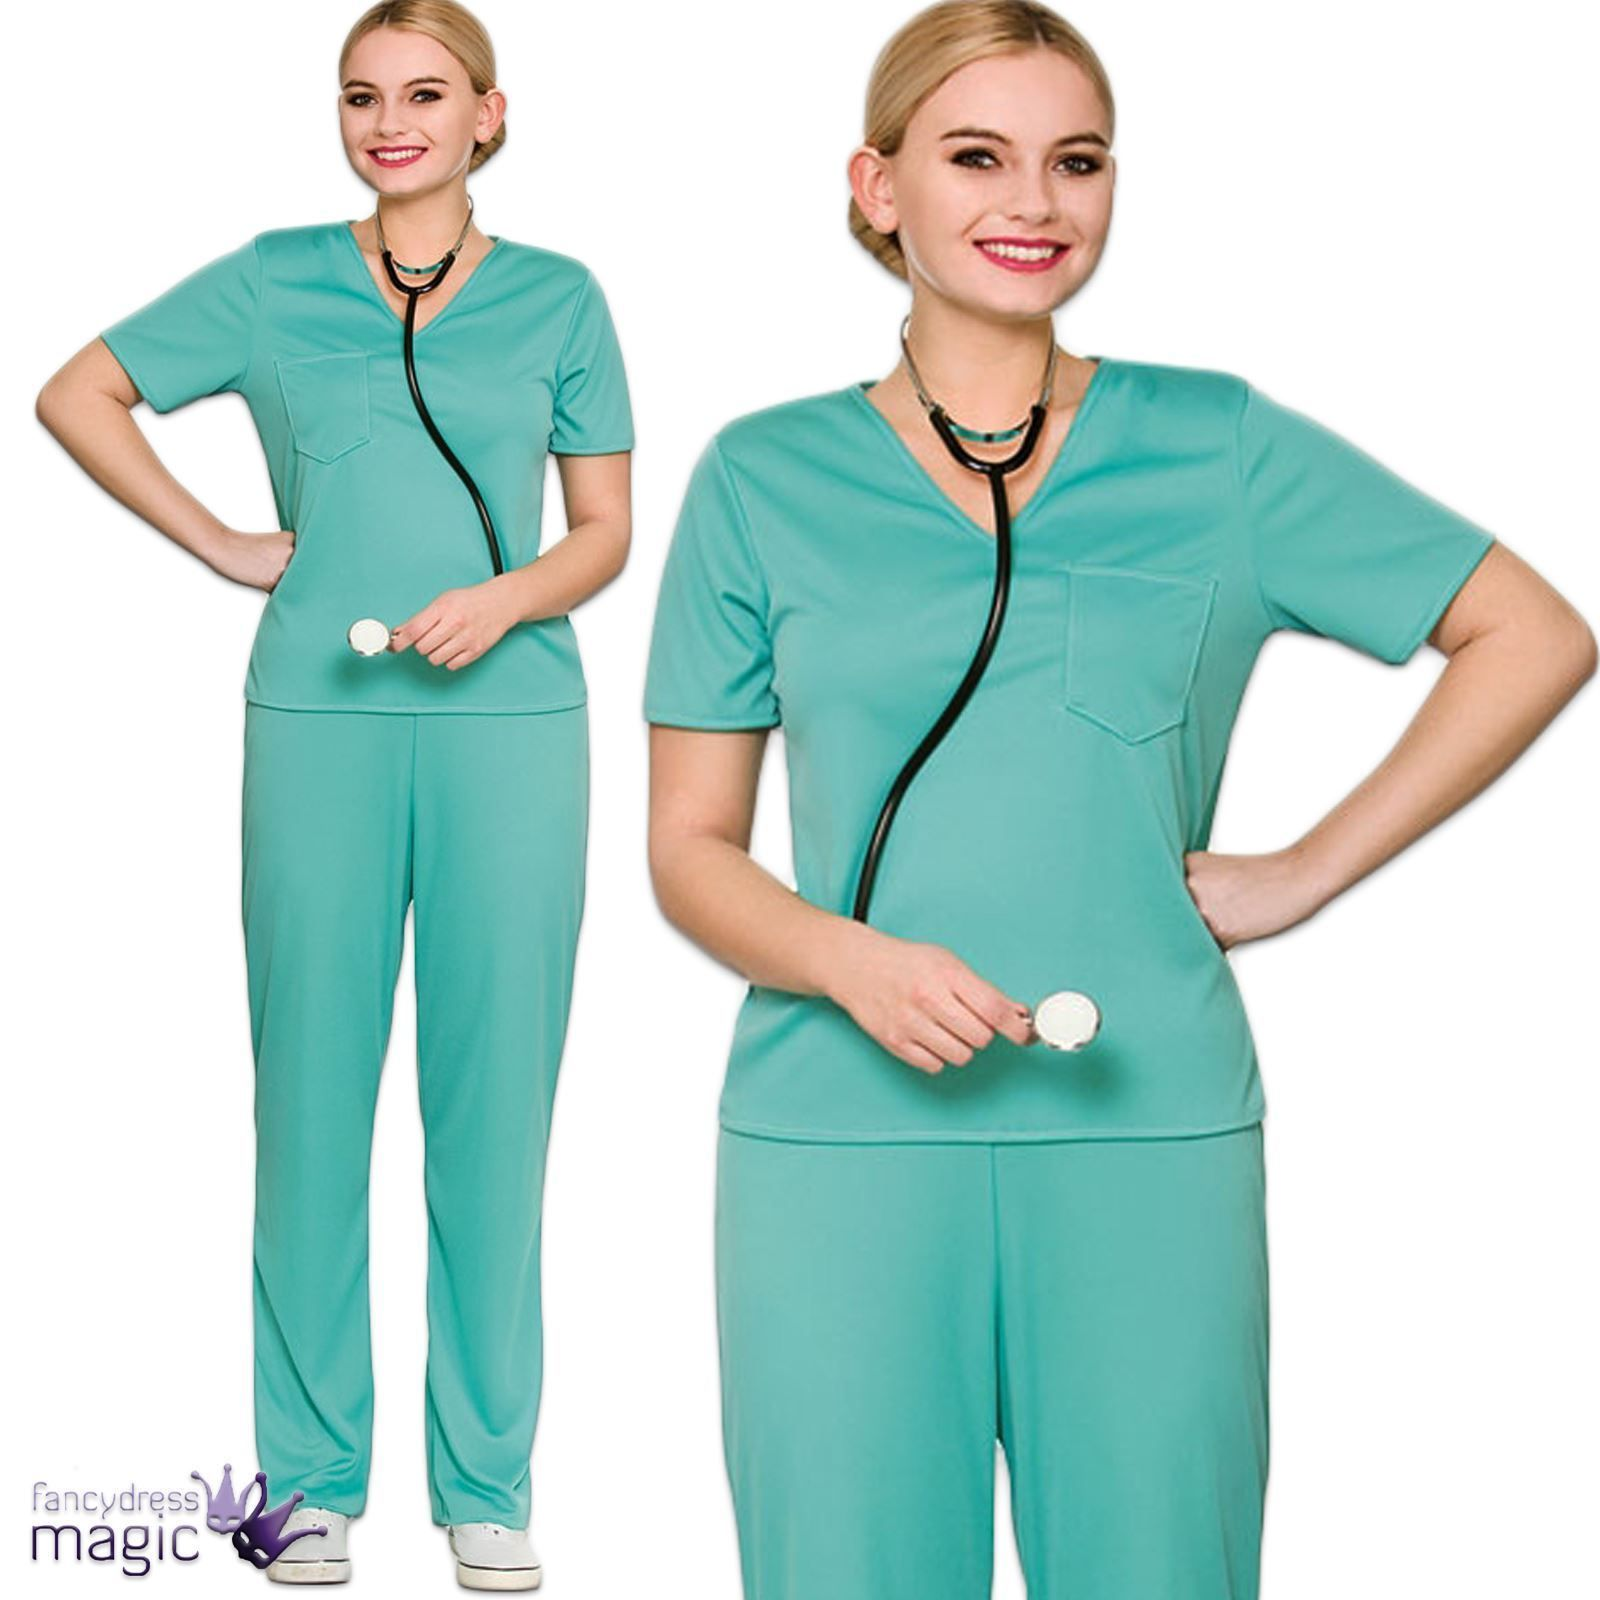 1a8cd85aa6f Ladies Adults ER Scrubs Doctor Surgeon Hospital Nurse Fancy Dress ...